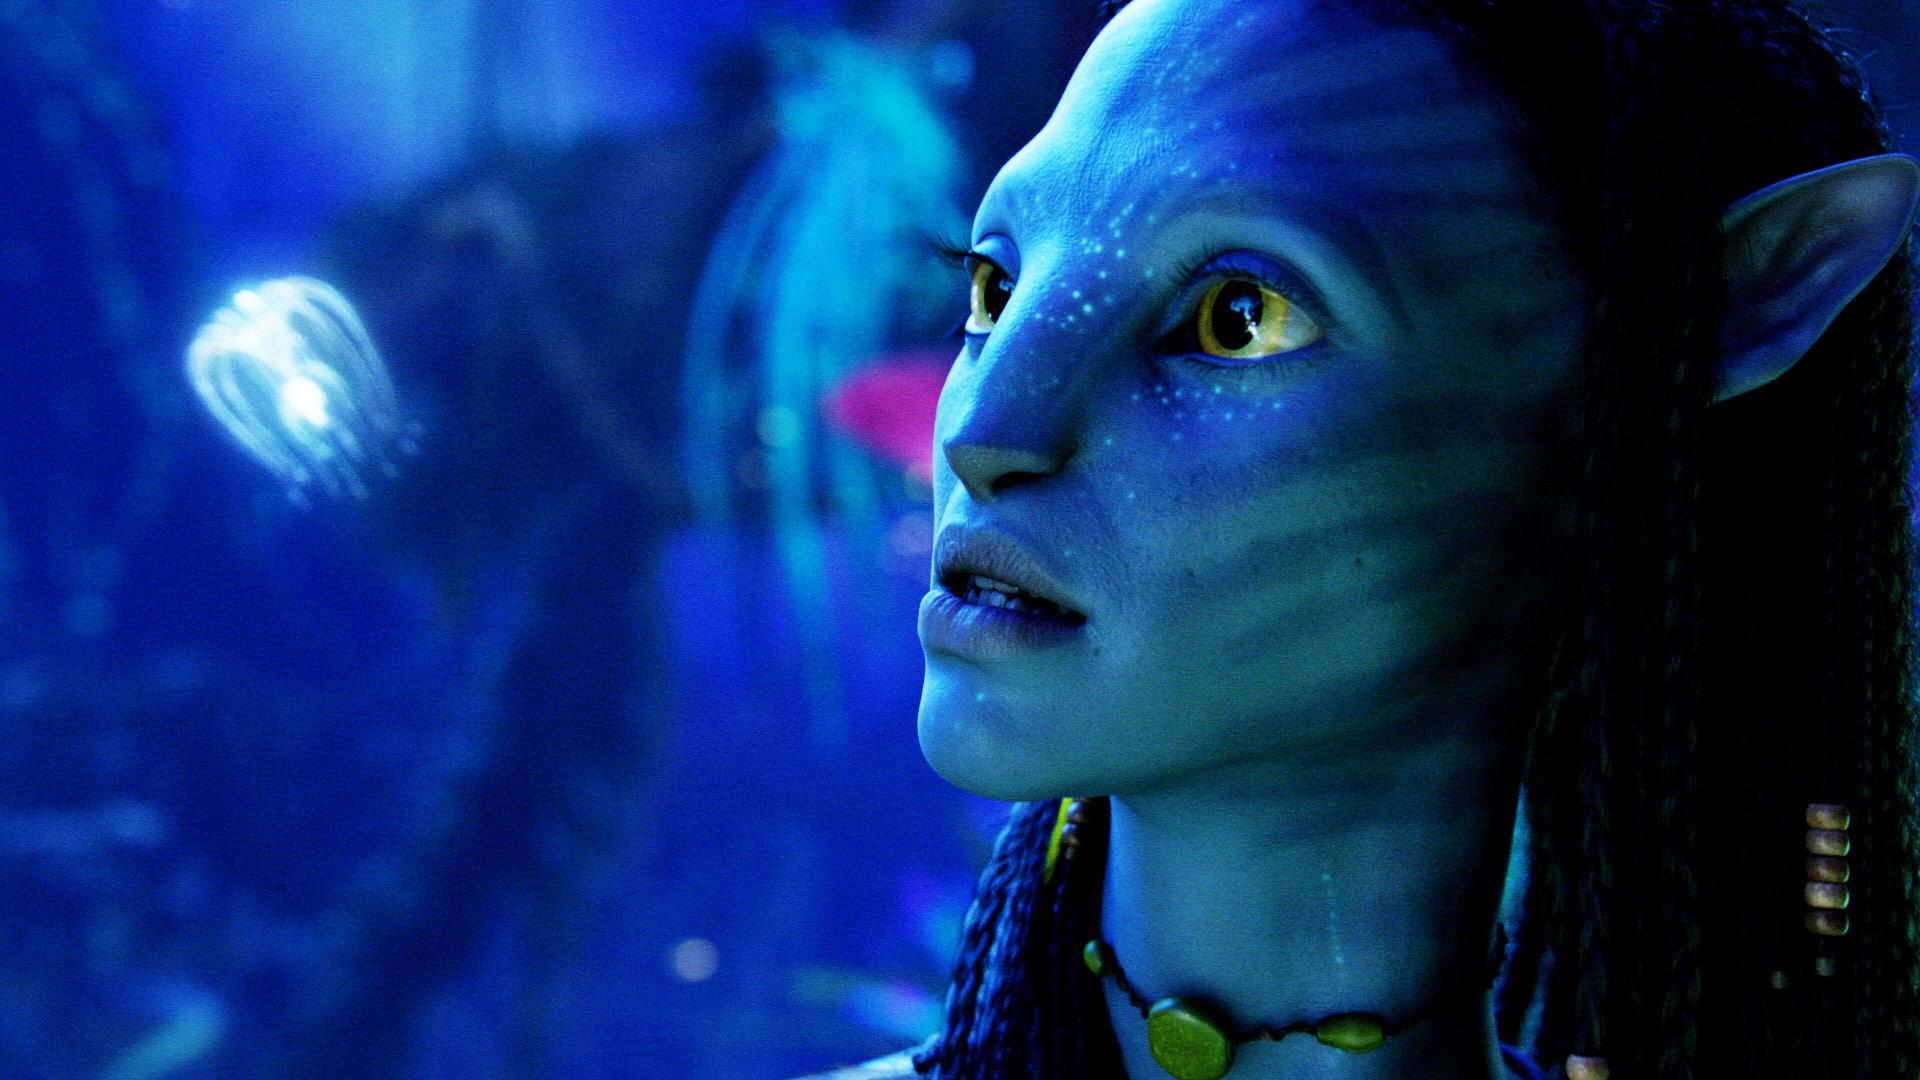 Ab 2018 geht James Camerons Avatar in Serie